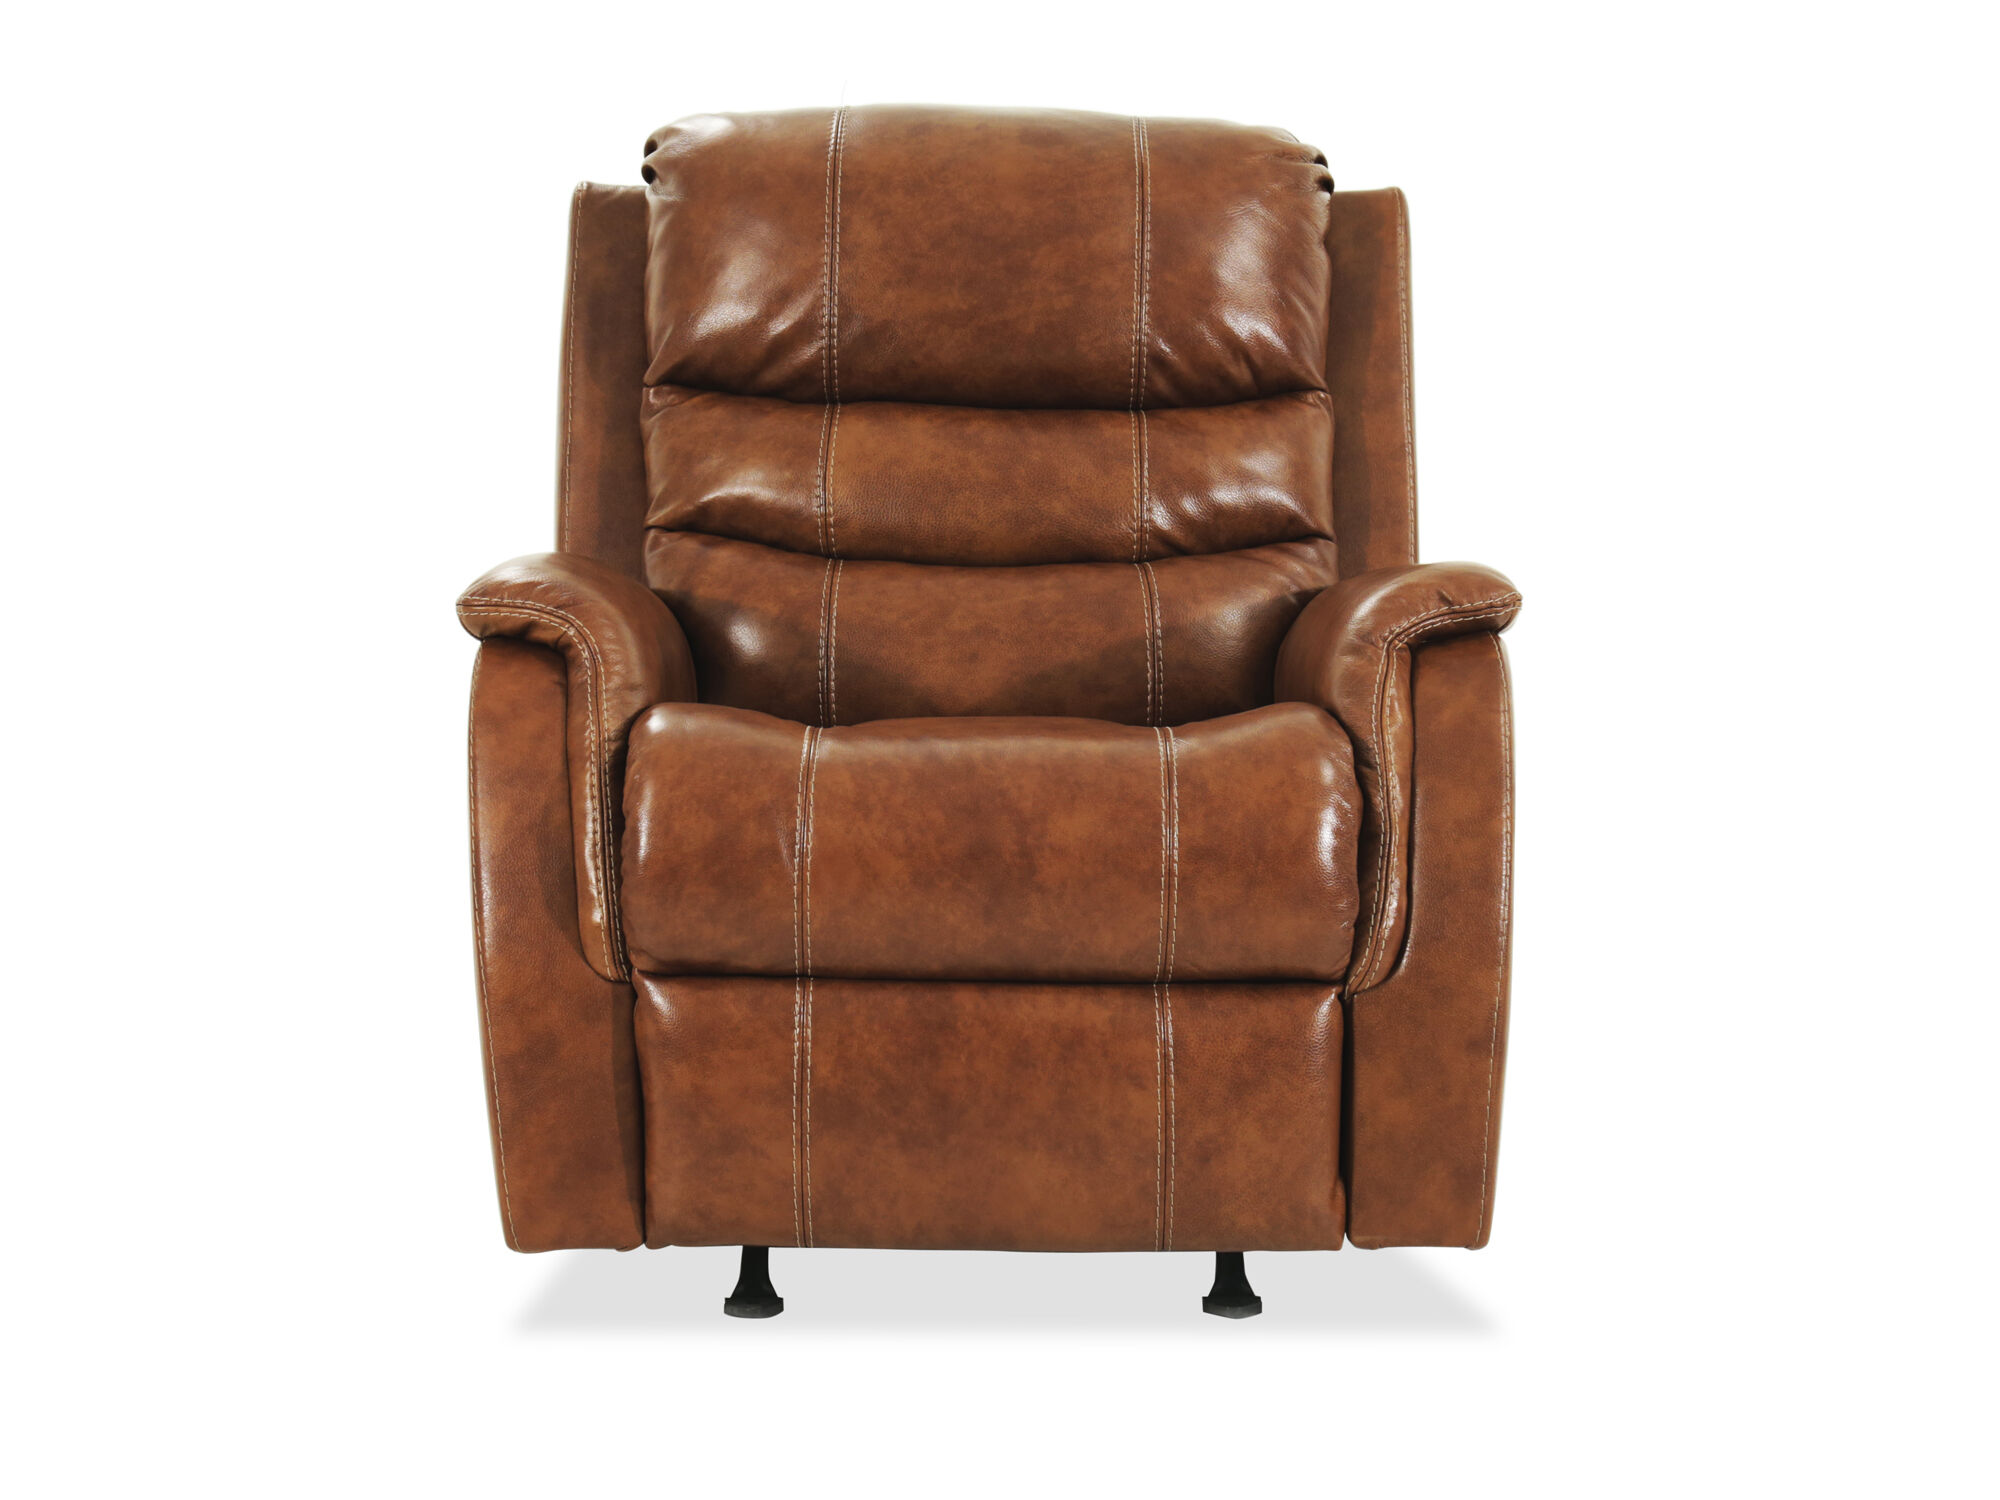 lauren ashley 60 zero wall sofa recliner american leather beds metcalf nutmeg power with adjustable